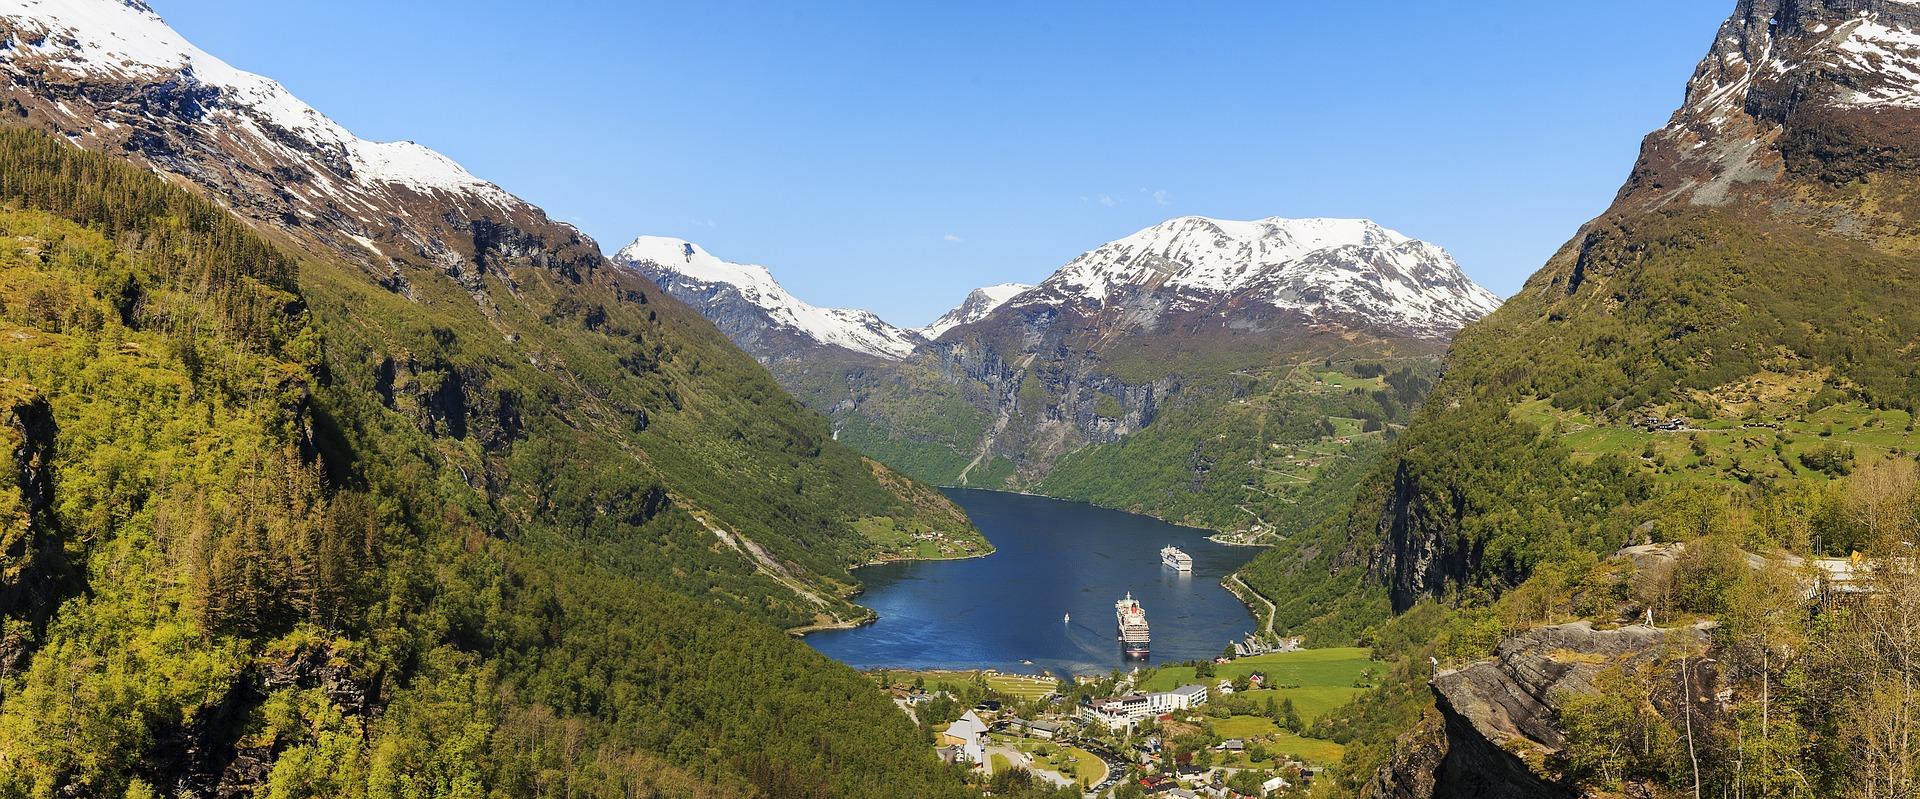 Die schönsten Facetten Norwegens - Bild